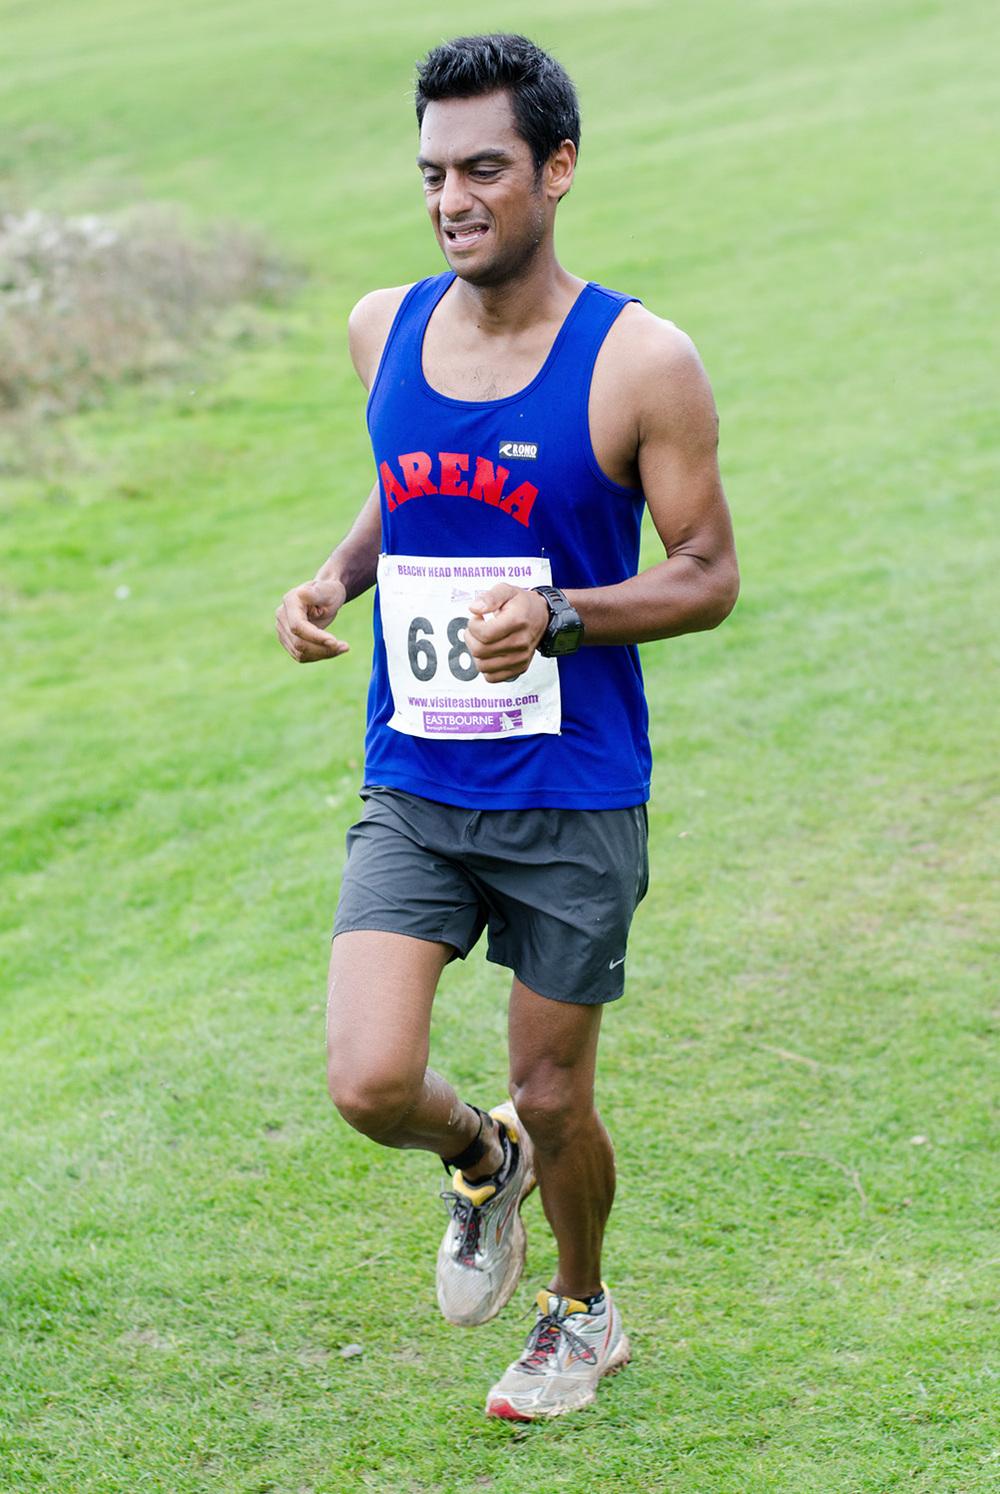 Beachy Head Marathon 2014 - Mile 24.75